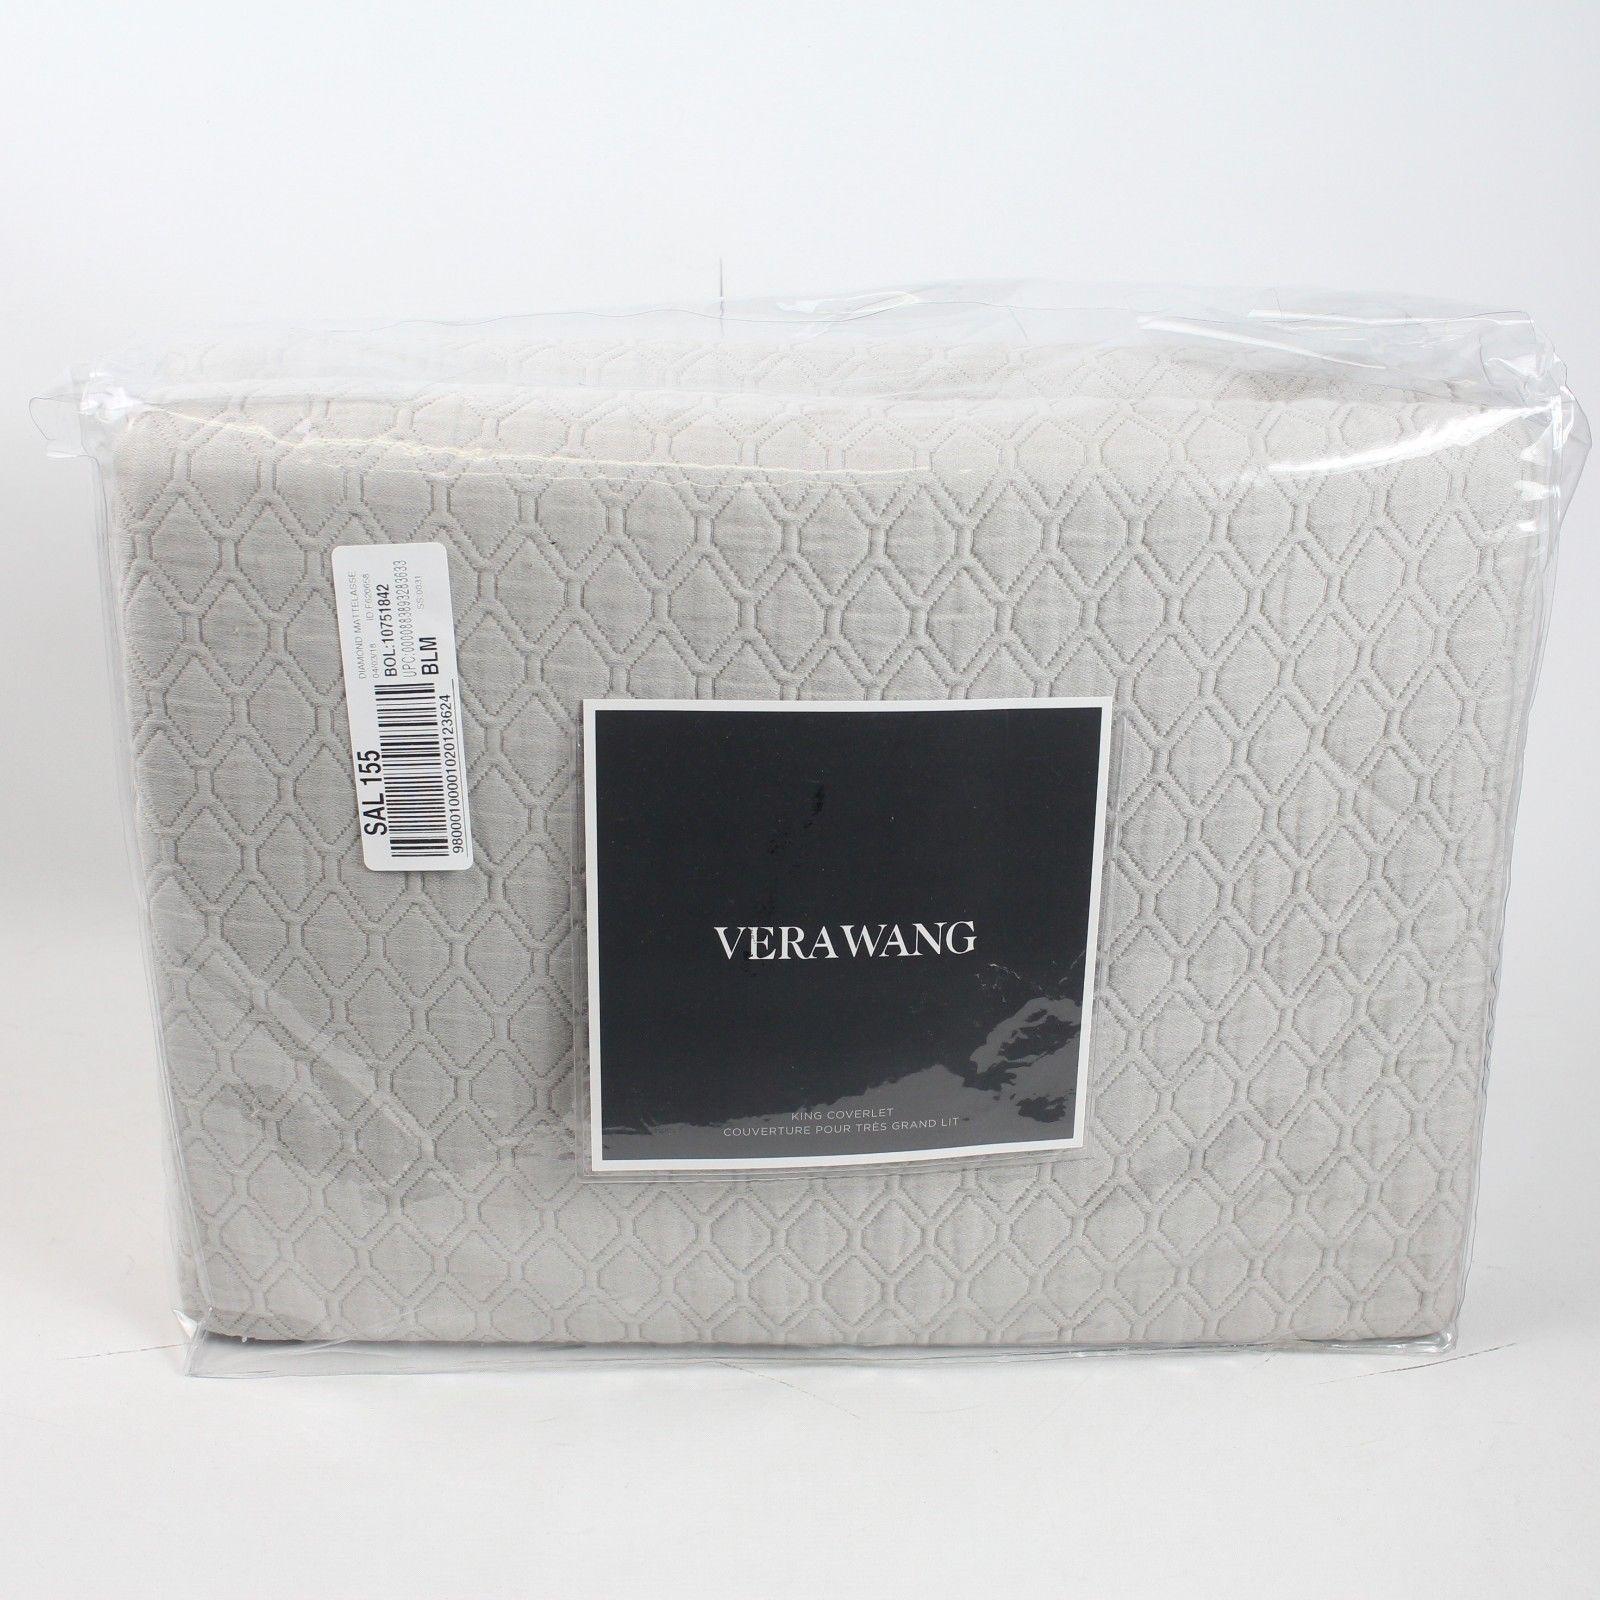 Vera Wang Bedding Puckered Diamond Matelasse King Coverlet